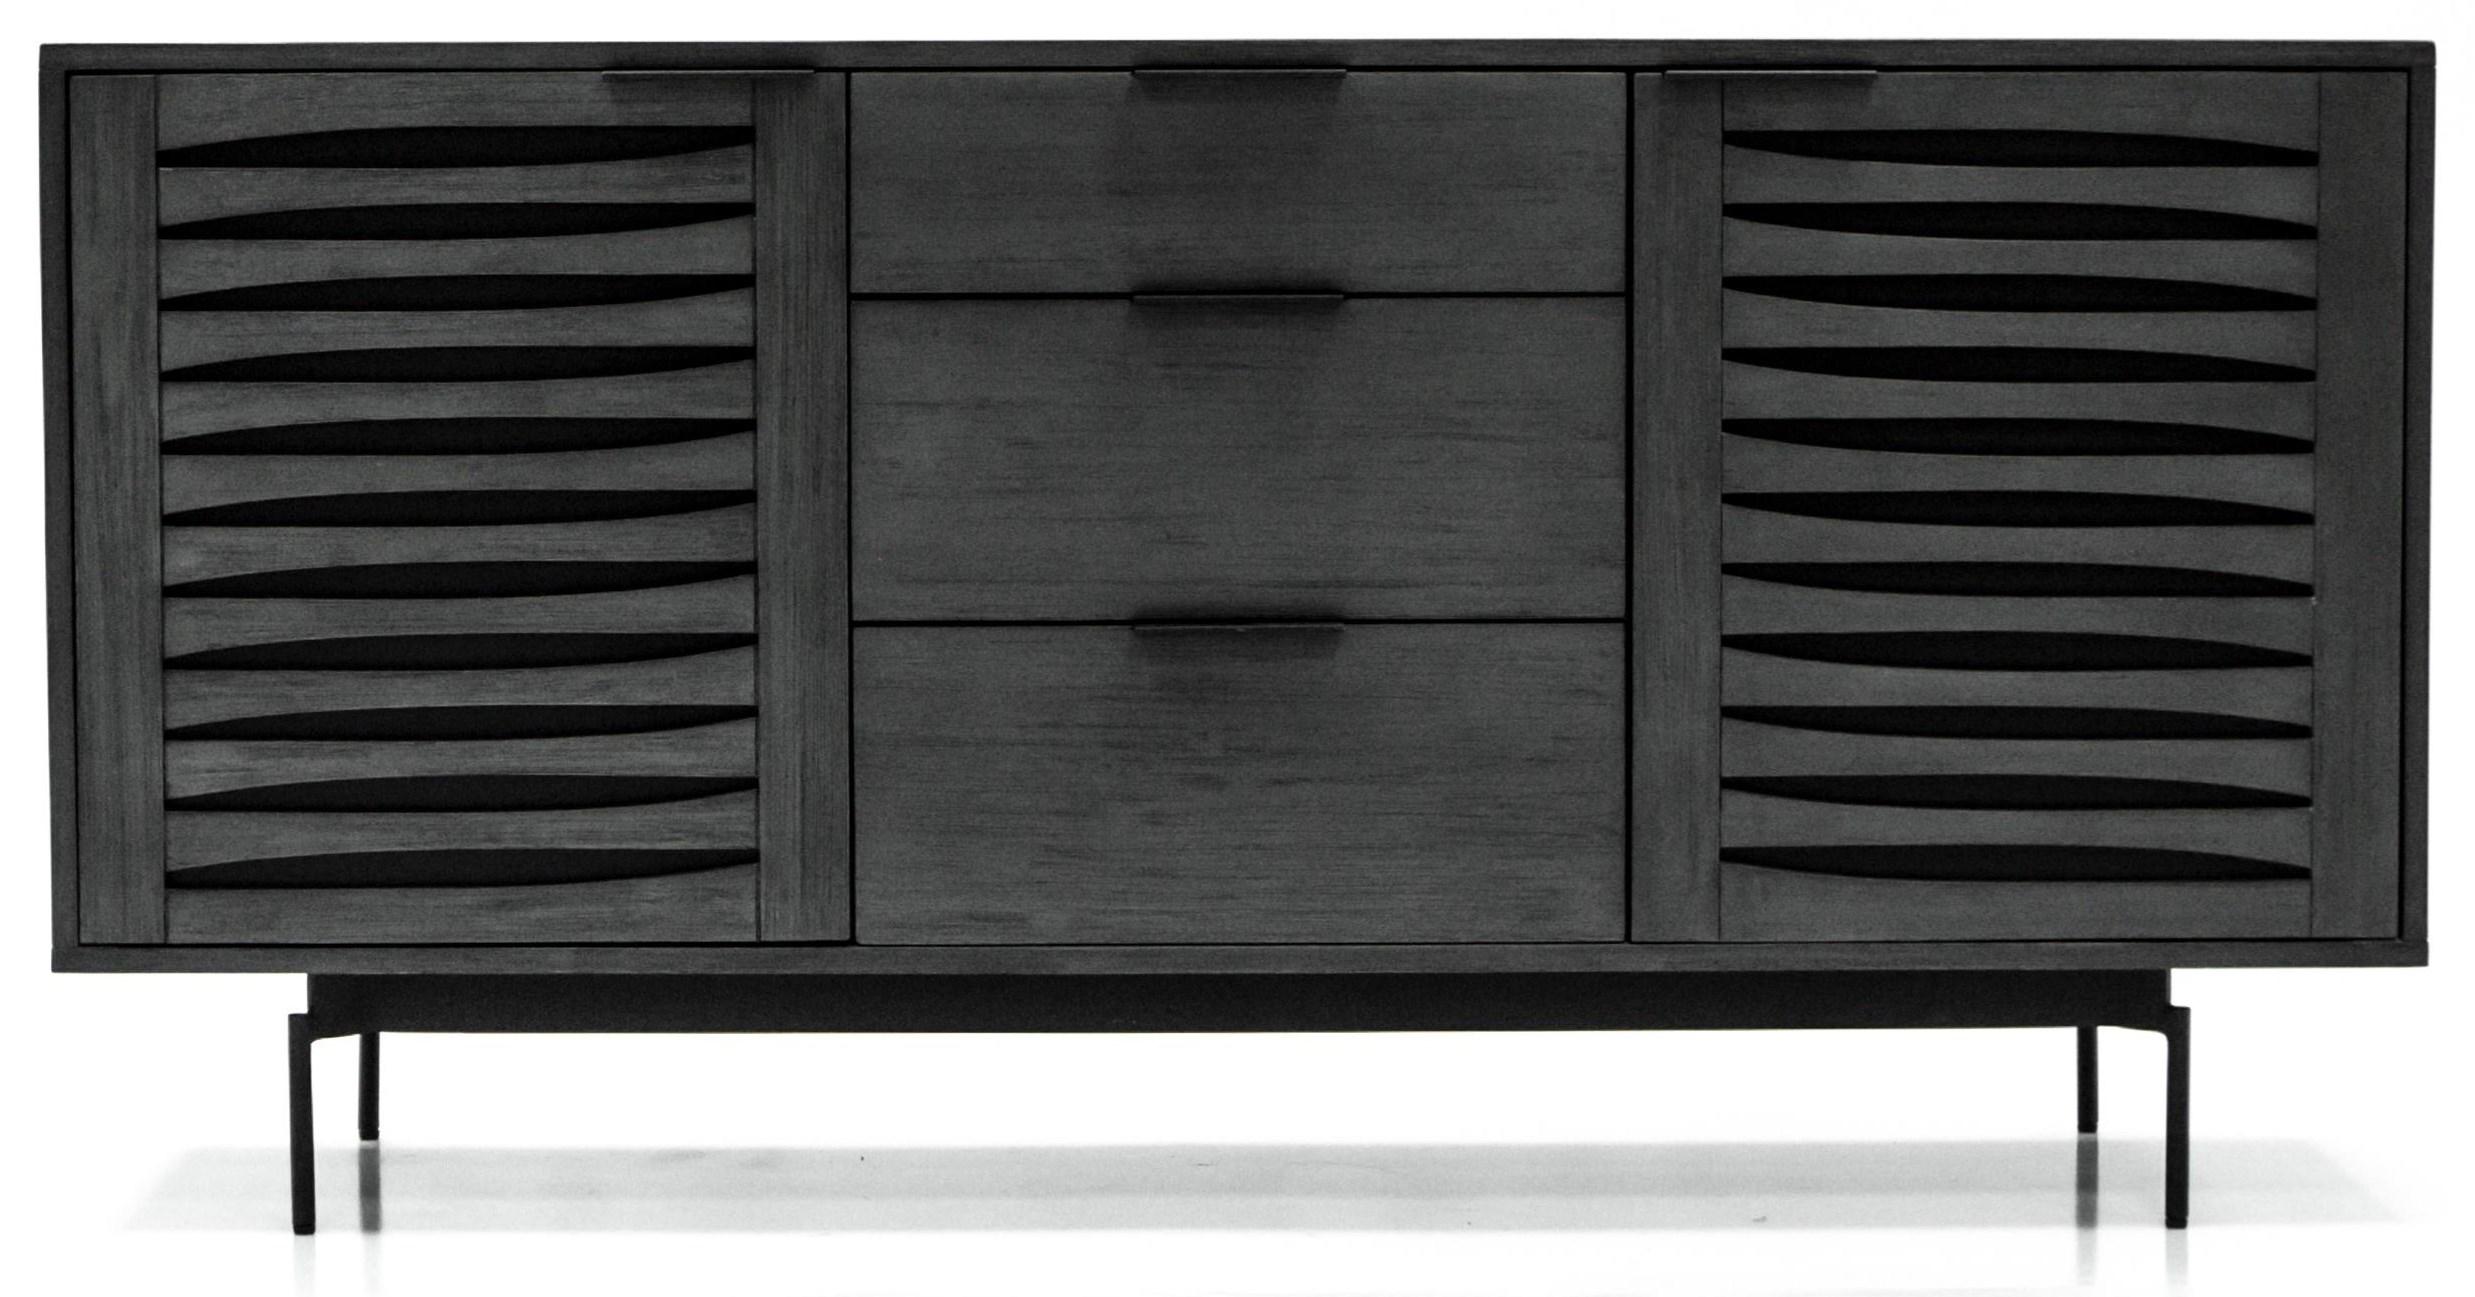 Kalyst Buffet by Design Evolution at HomeWorld Furniture